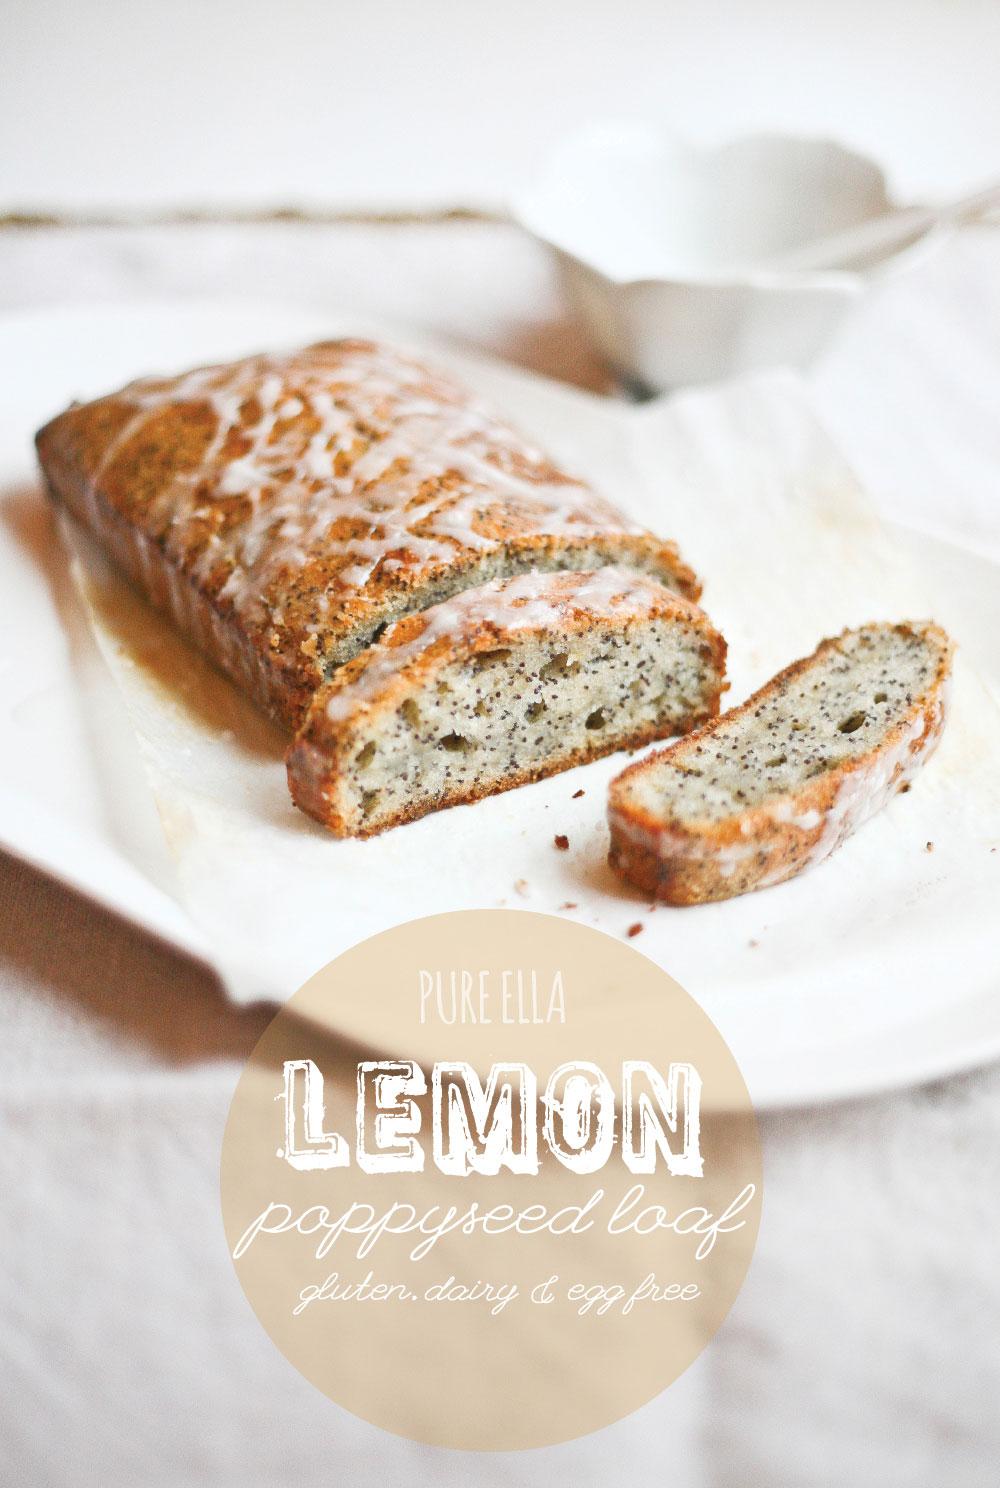 Gluten Free Dairy Free Pound Cake Recipes